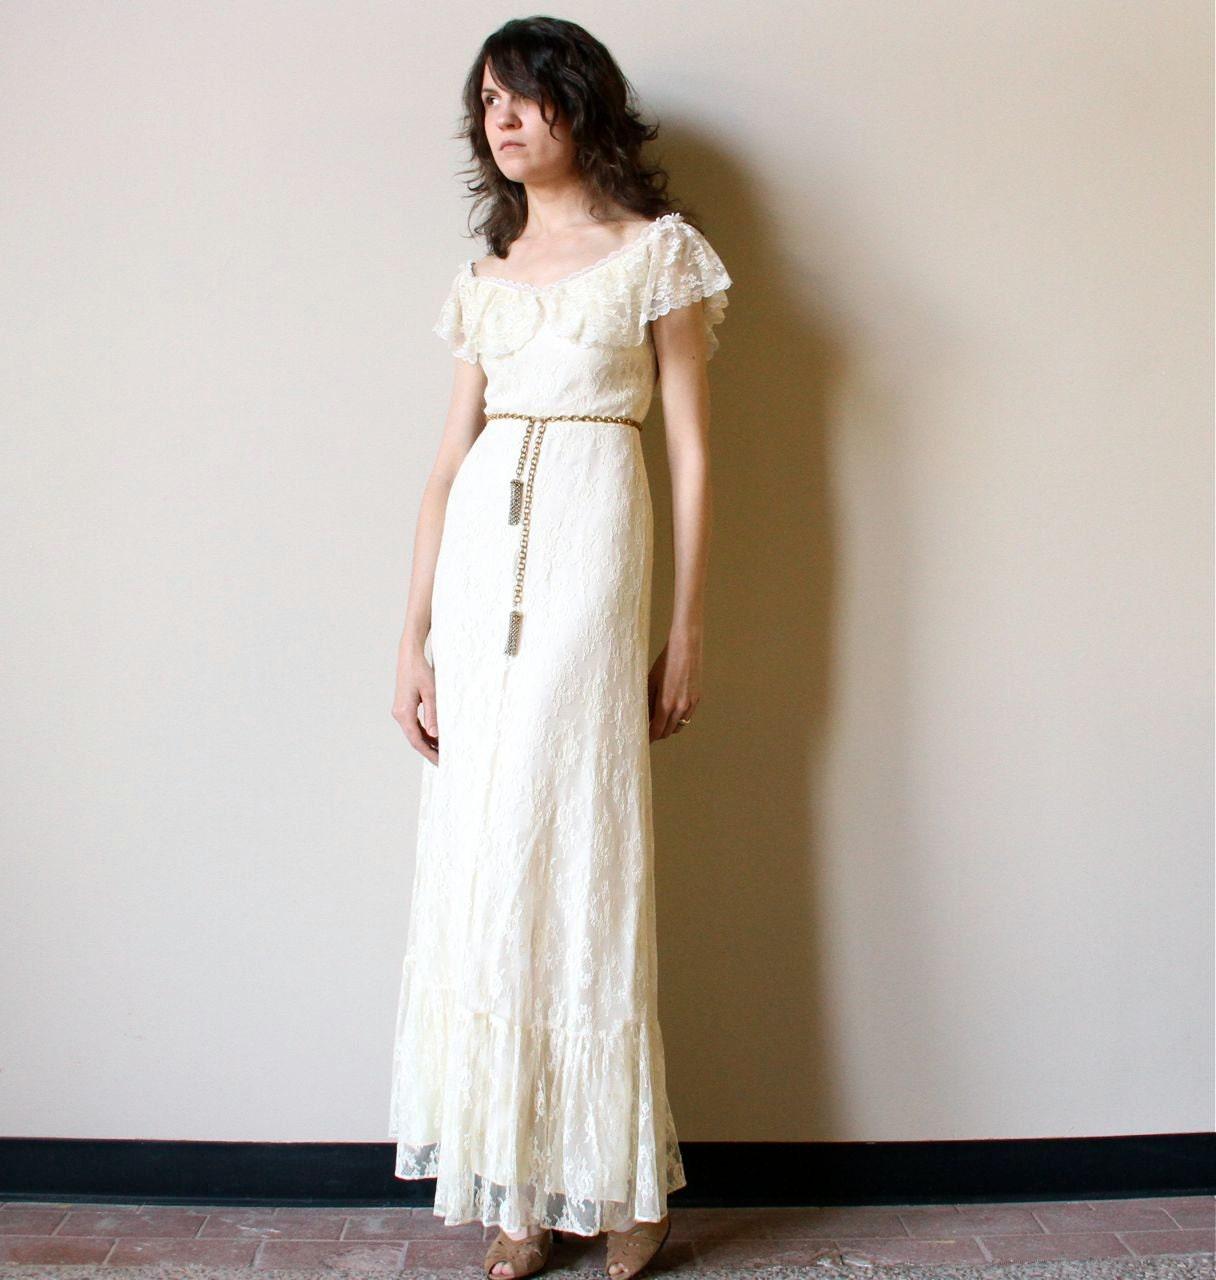 Vintage Wedding Dresses Canada: 70s Boho Wedding Dress Vintage Off White Ivory By